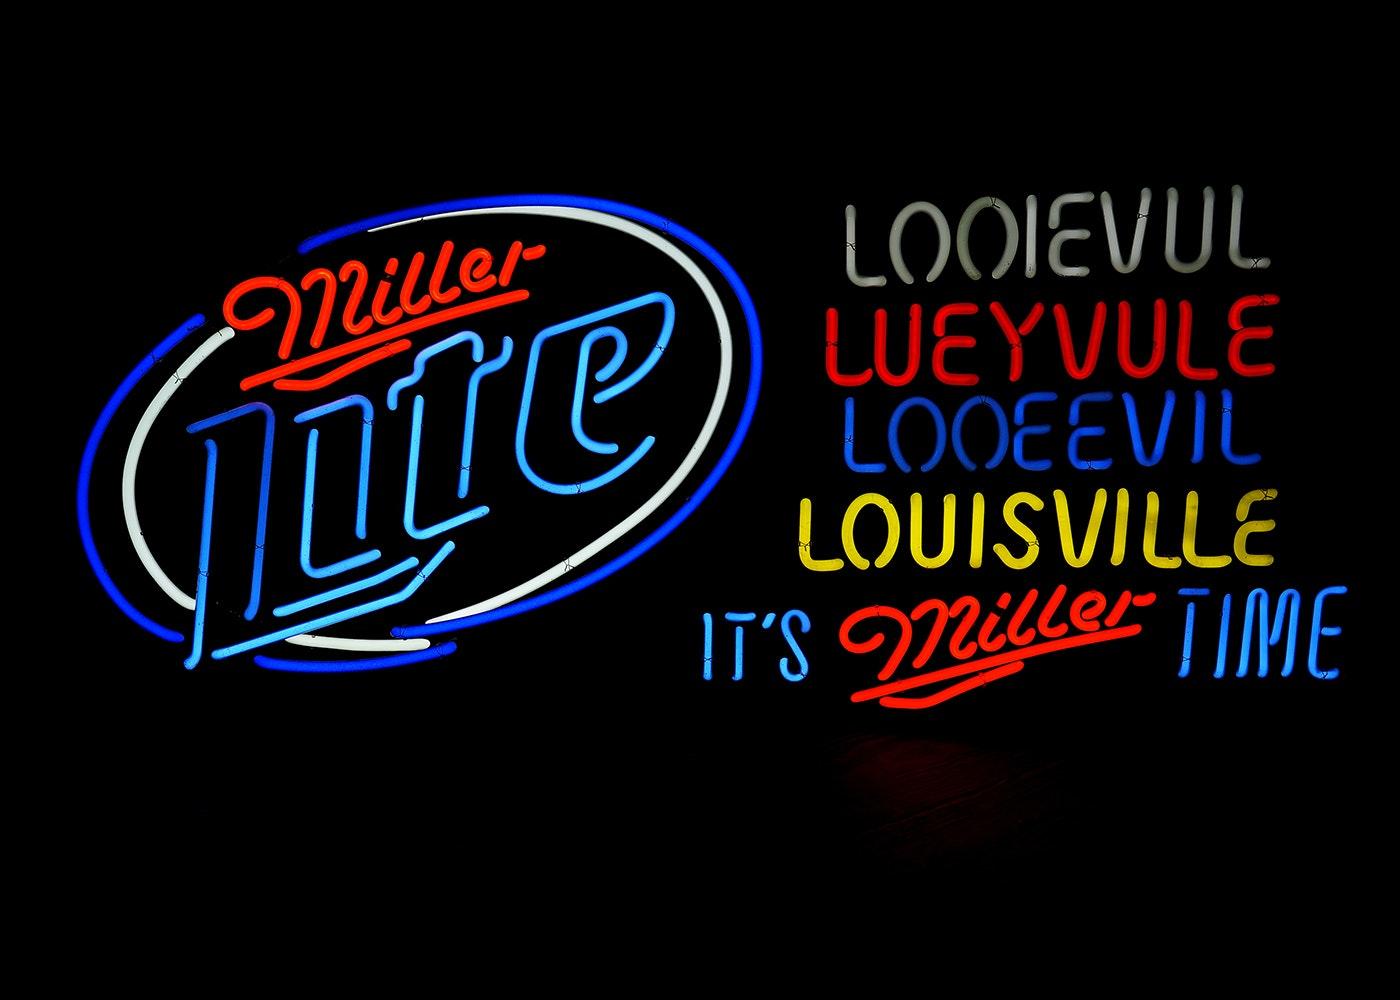 Louisville Ky Advertising Sports Memorabilia